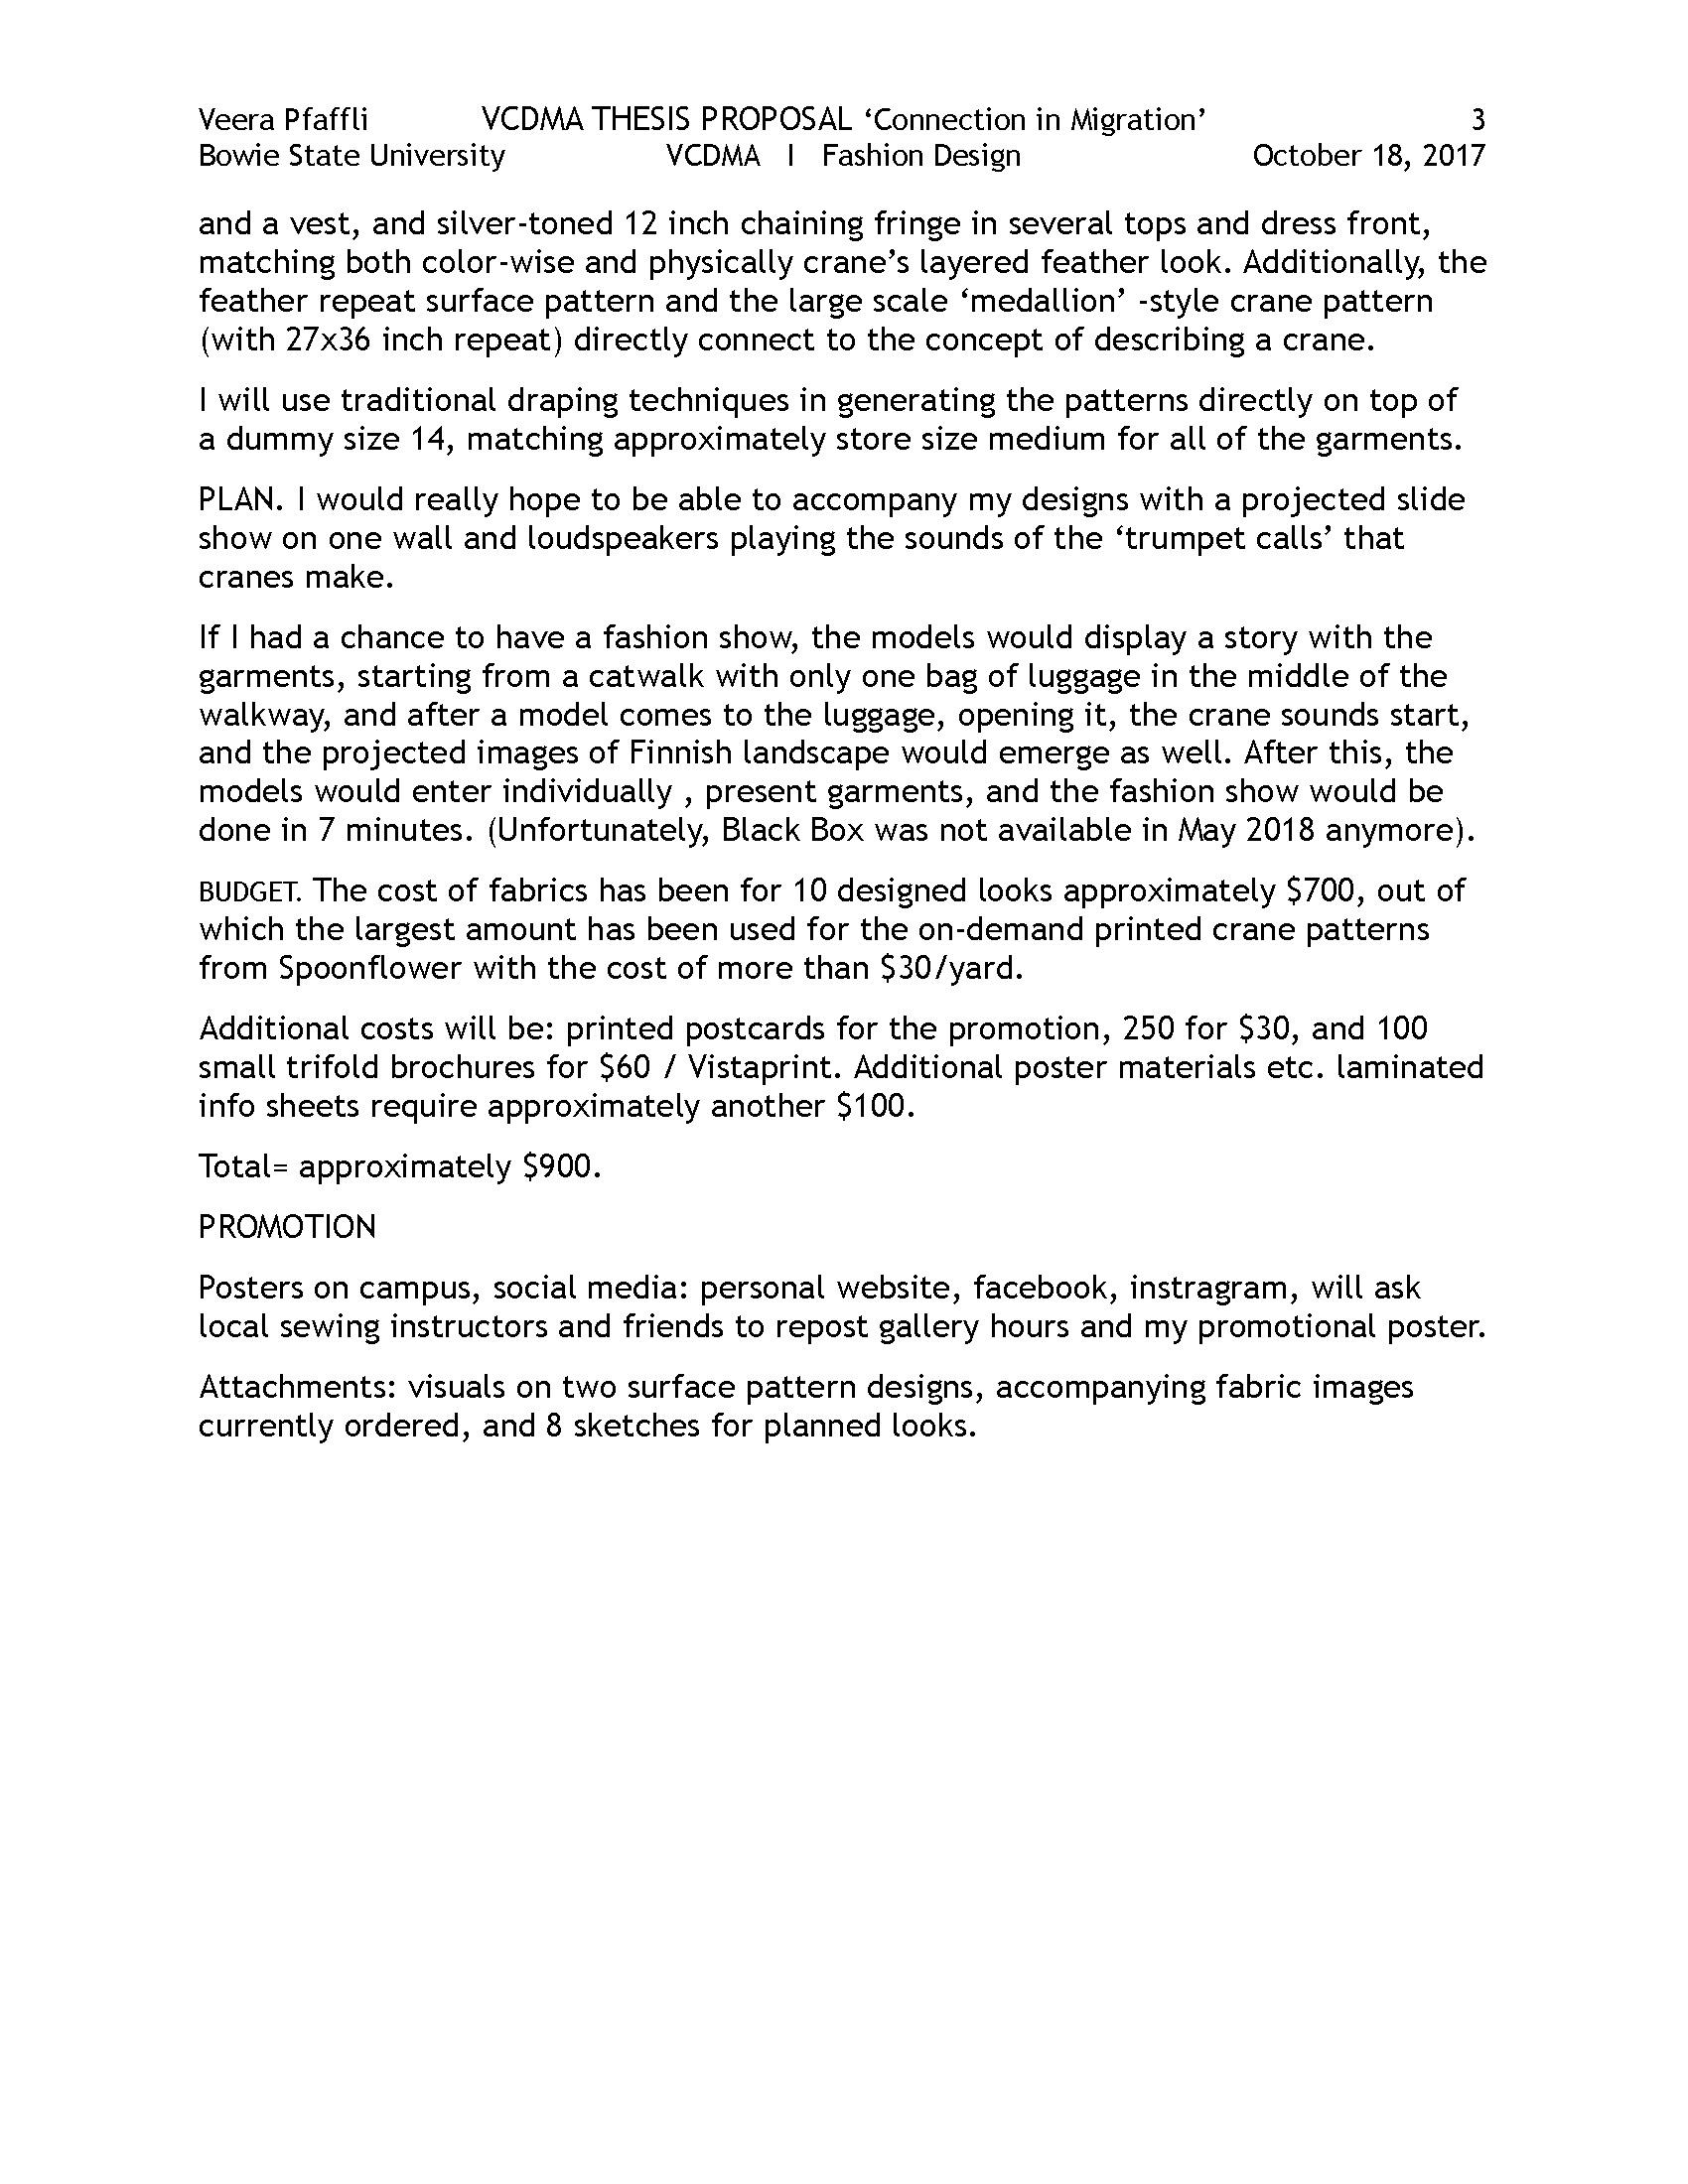 PfaffliVCDMAThesisProposal (2)_Page_03.jpg